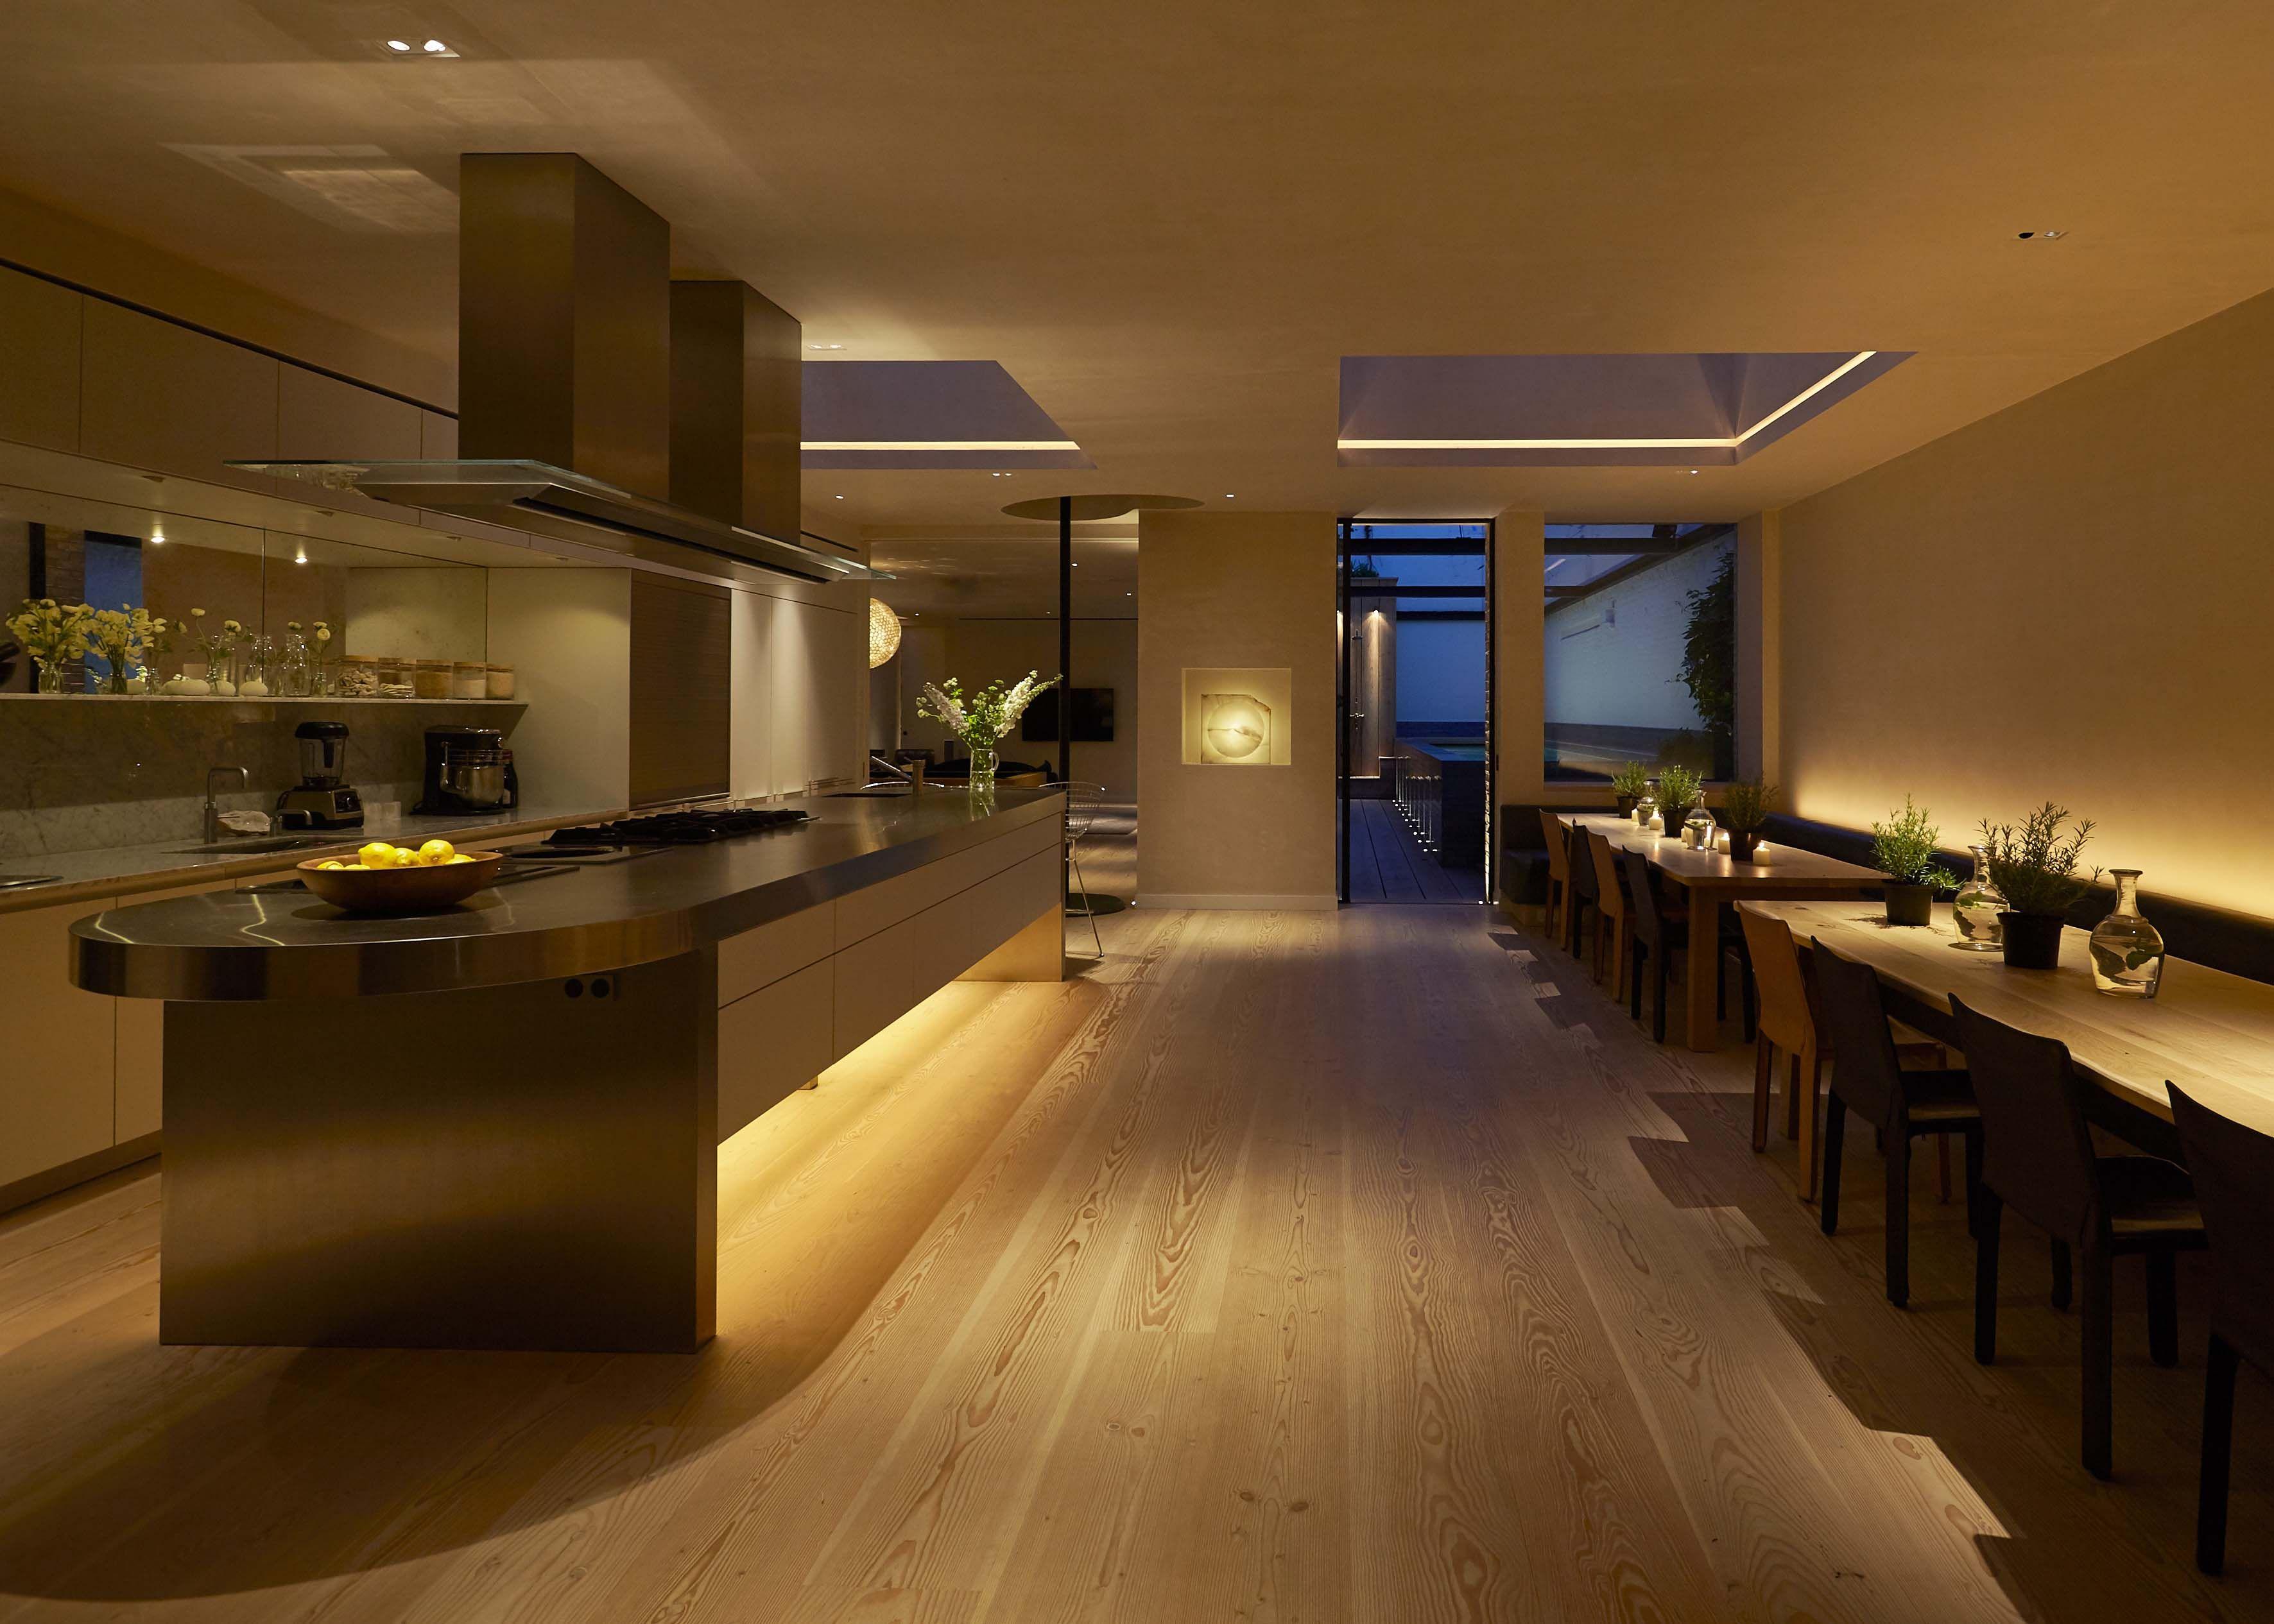 John Cullen Kitchen Lighting 97a Light Architecture